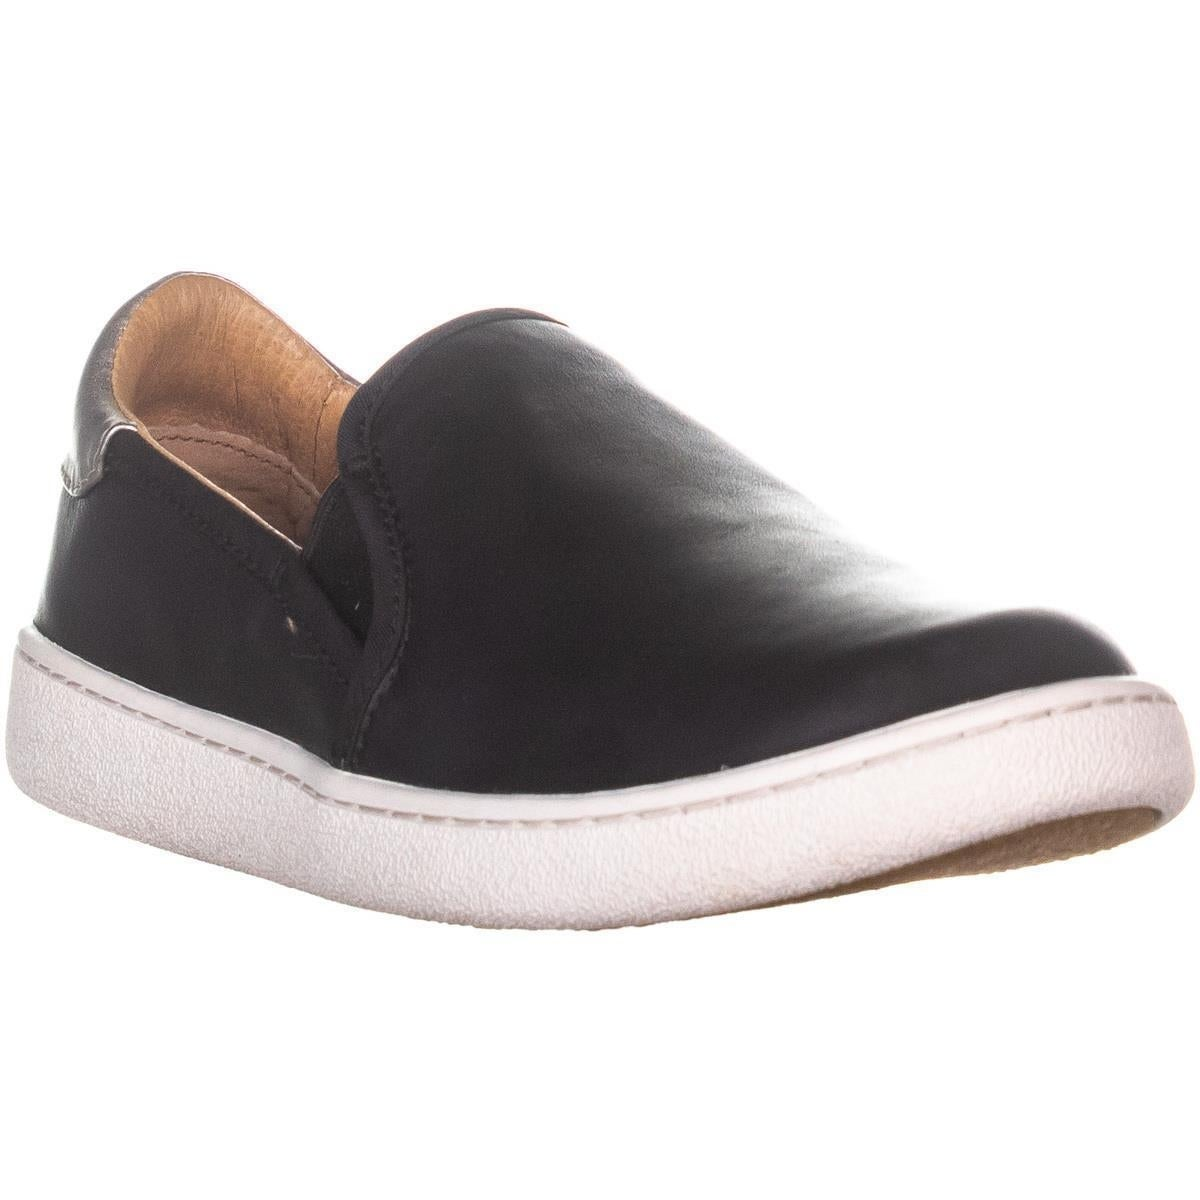 UGG Cas Slip On Sneakers